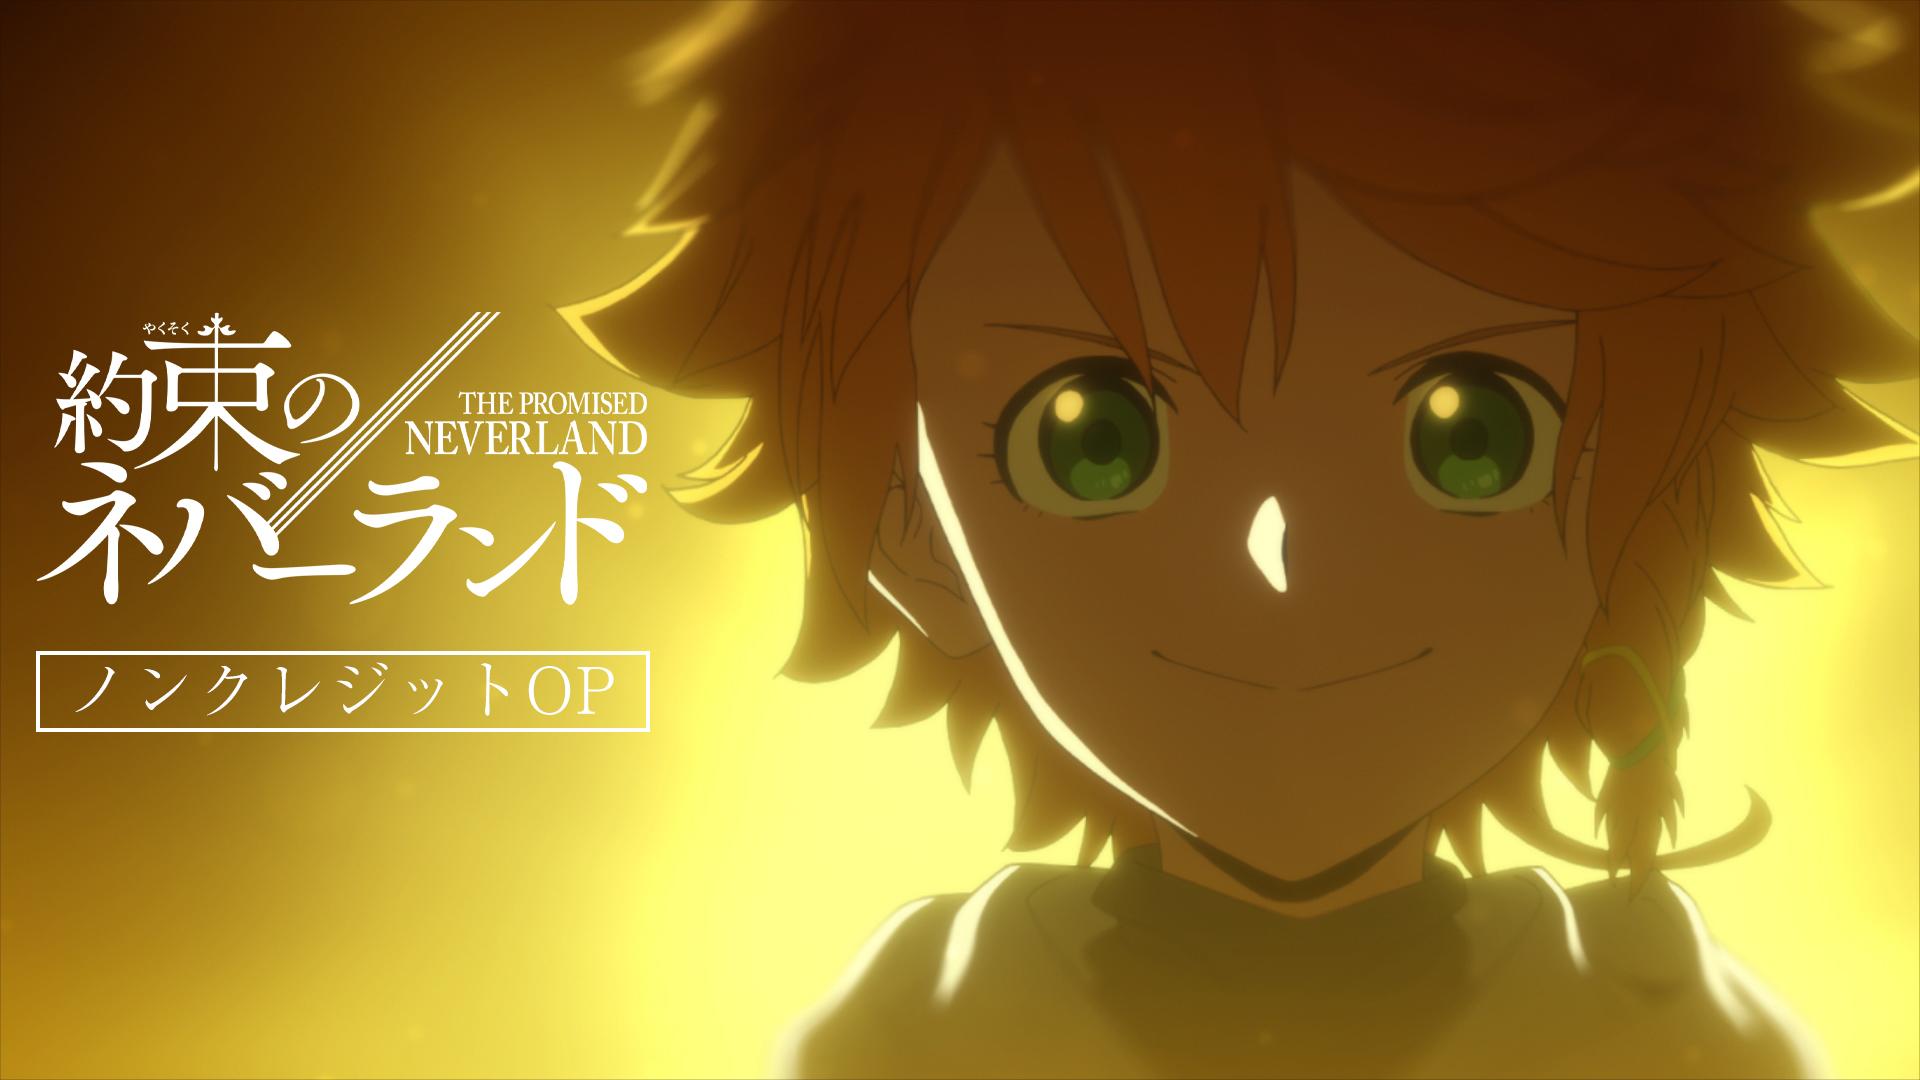 TVアニメ「約束のネバーランド」Season 2 OP&EDムービー公開!エマとレイが描かれたOPアニメ盤ジャケットも解禁